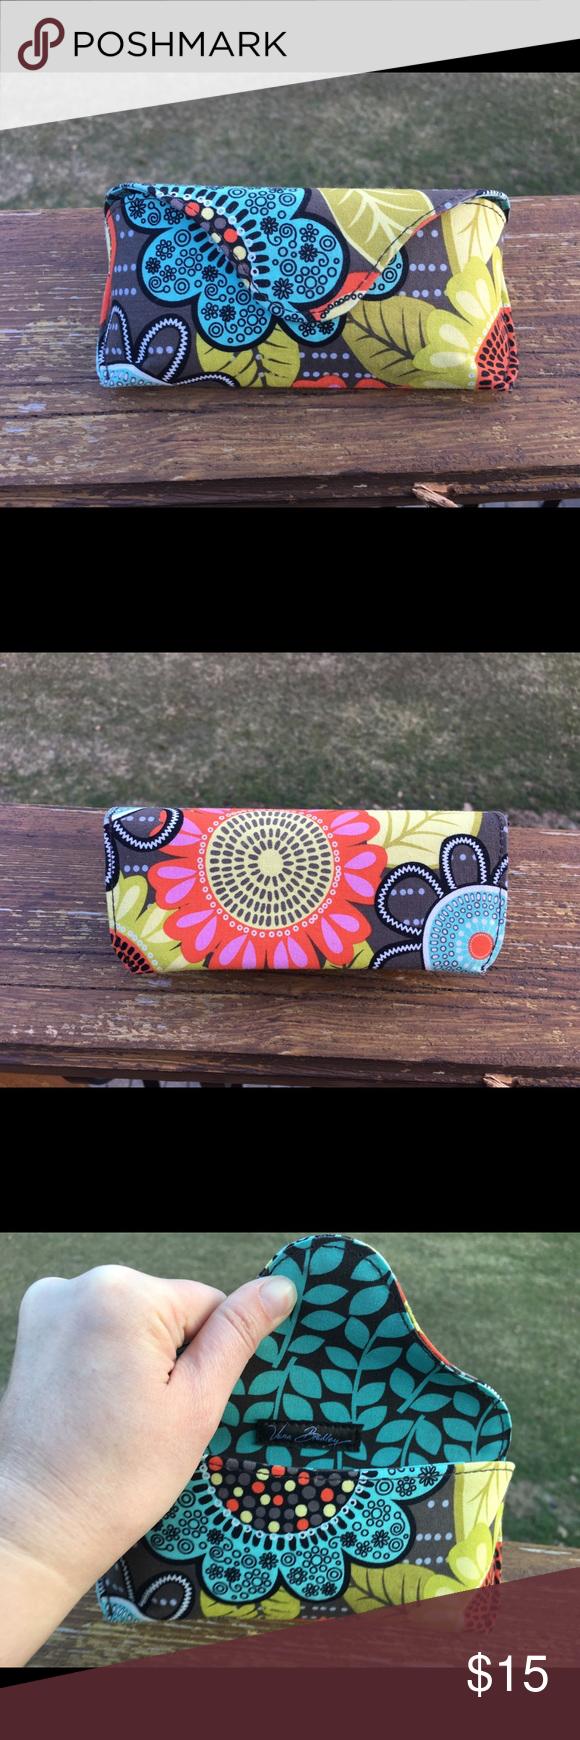 Vera Bradley Hard sunglasses case. Flower power print. Barely used sunglasses case, in great condition. Vera Bradley Accessories Sunglasses